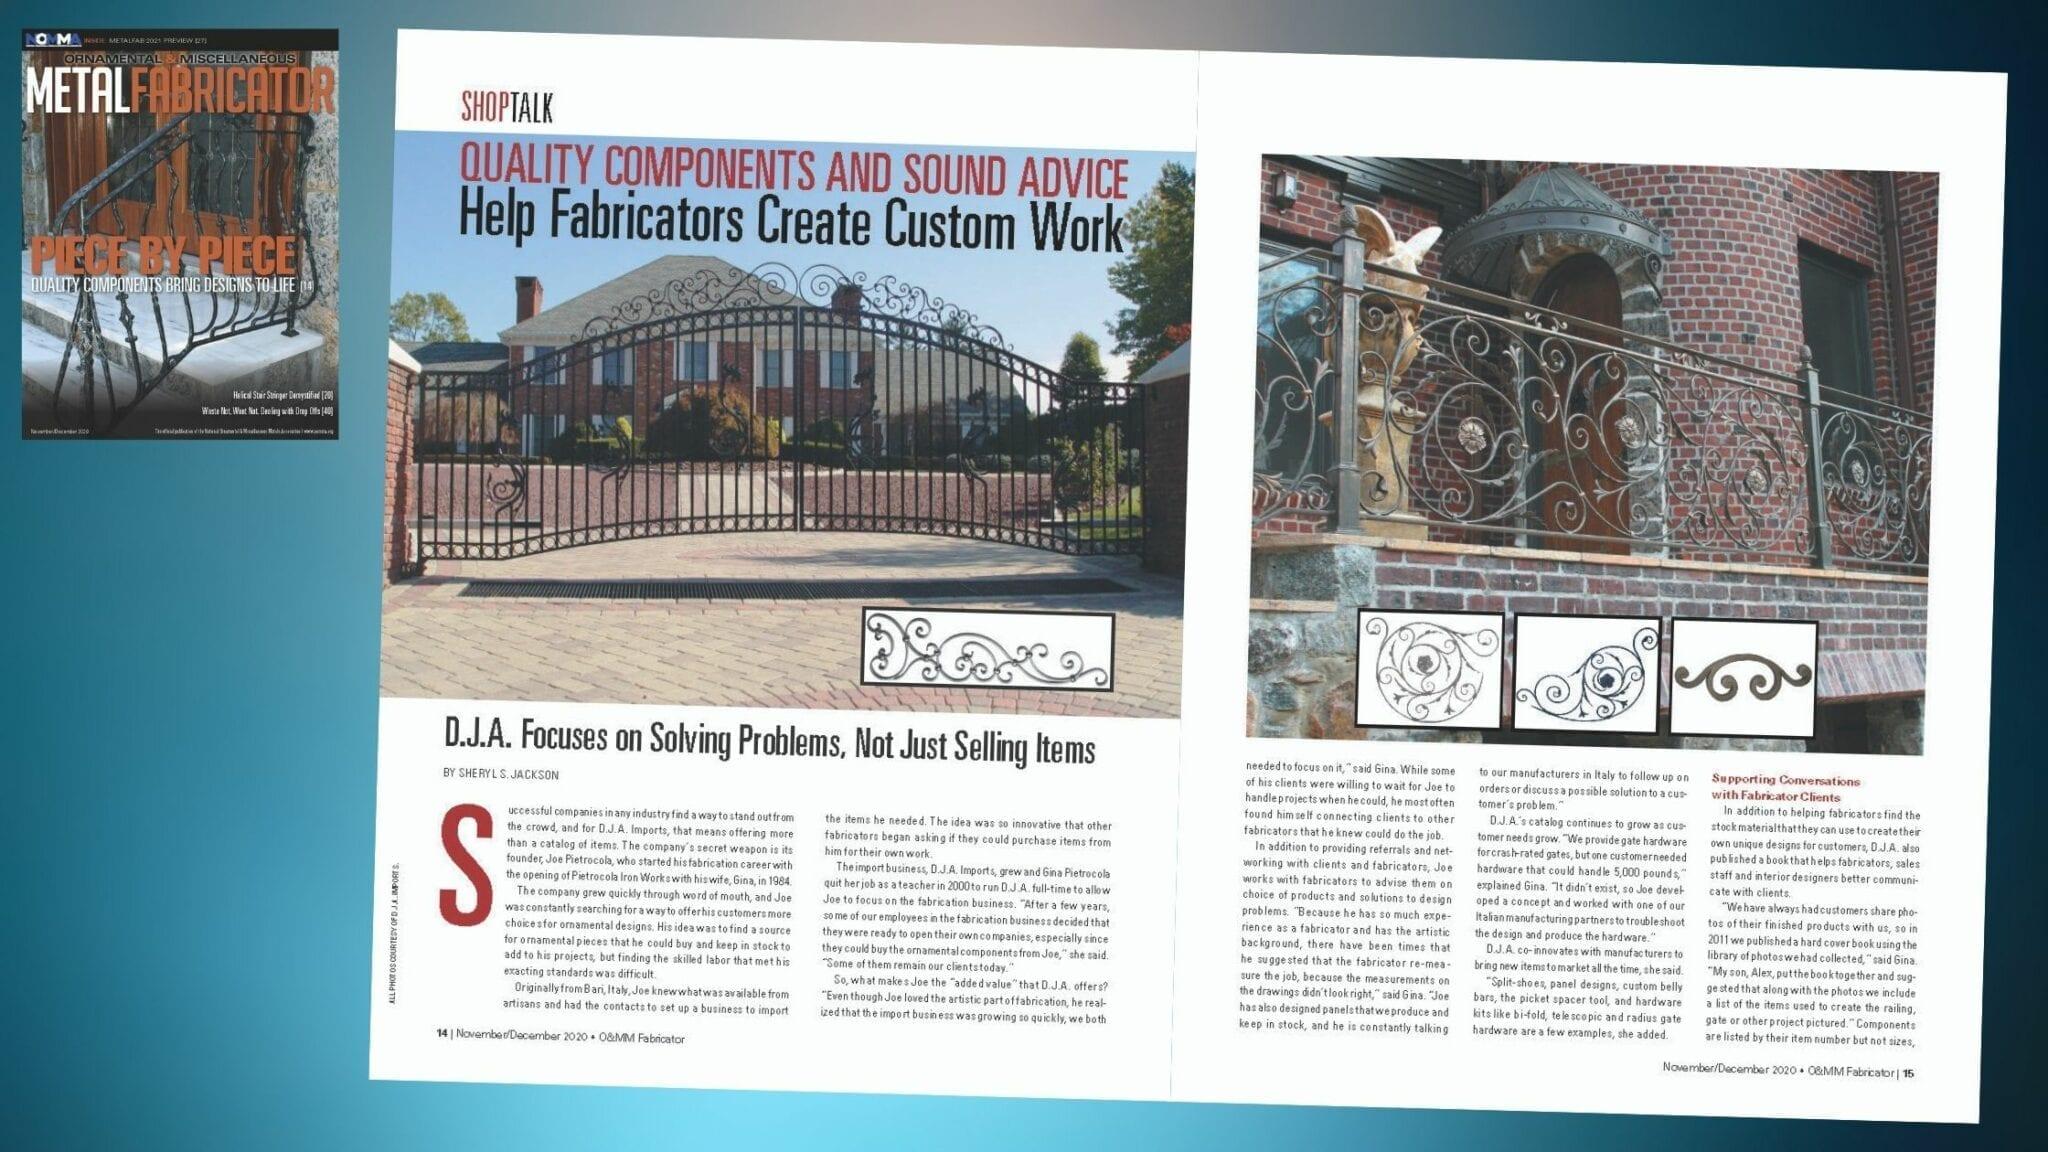 Cover story of NOMMA Fabricator magazine, November 2020